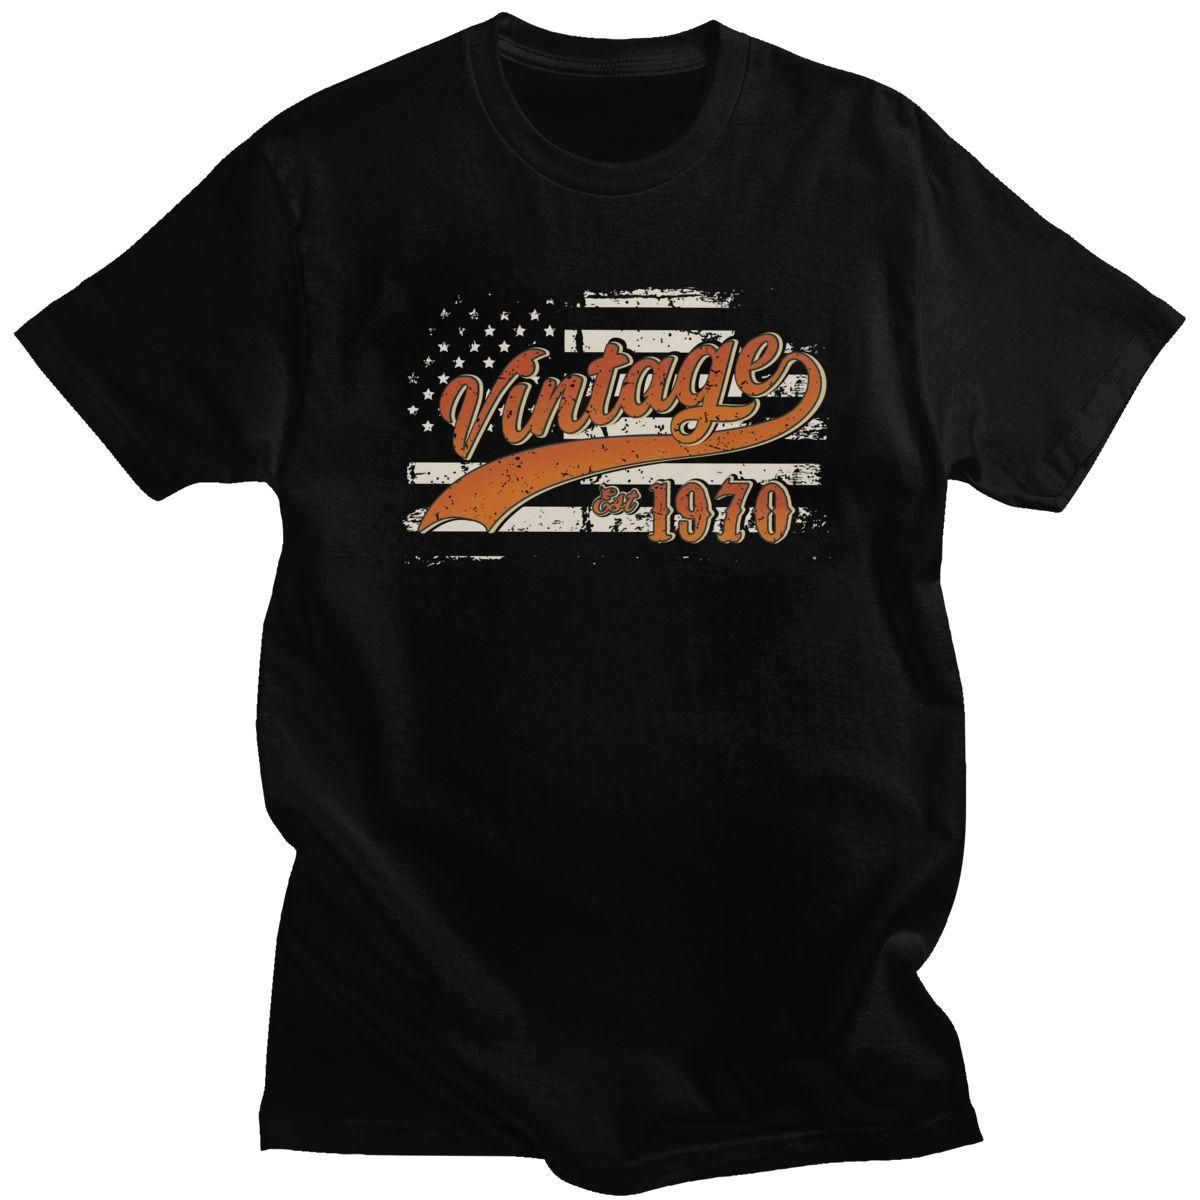 Kühle Retro Vintage Est 1970 T Shirts Männer Kurzarm Freizeit USA Flaggen-Geschenk 4. Juli T-Shirt O-Ansatz Cotton Tee Oberseiten-Kleidung